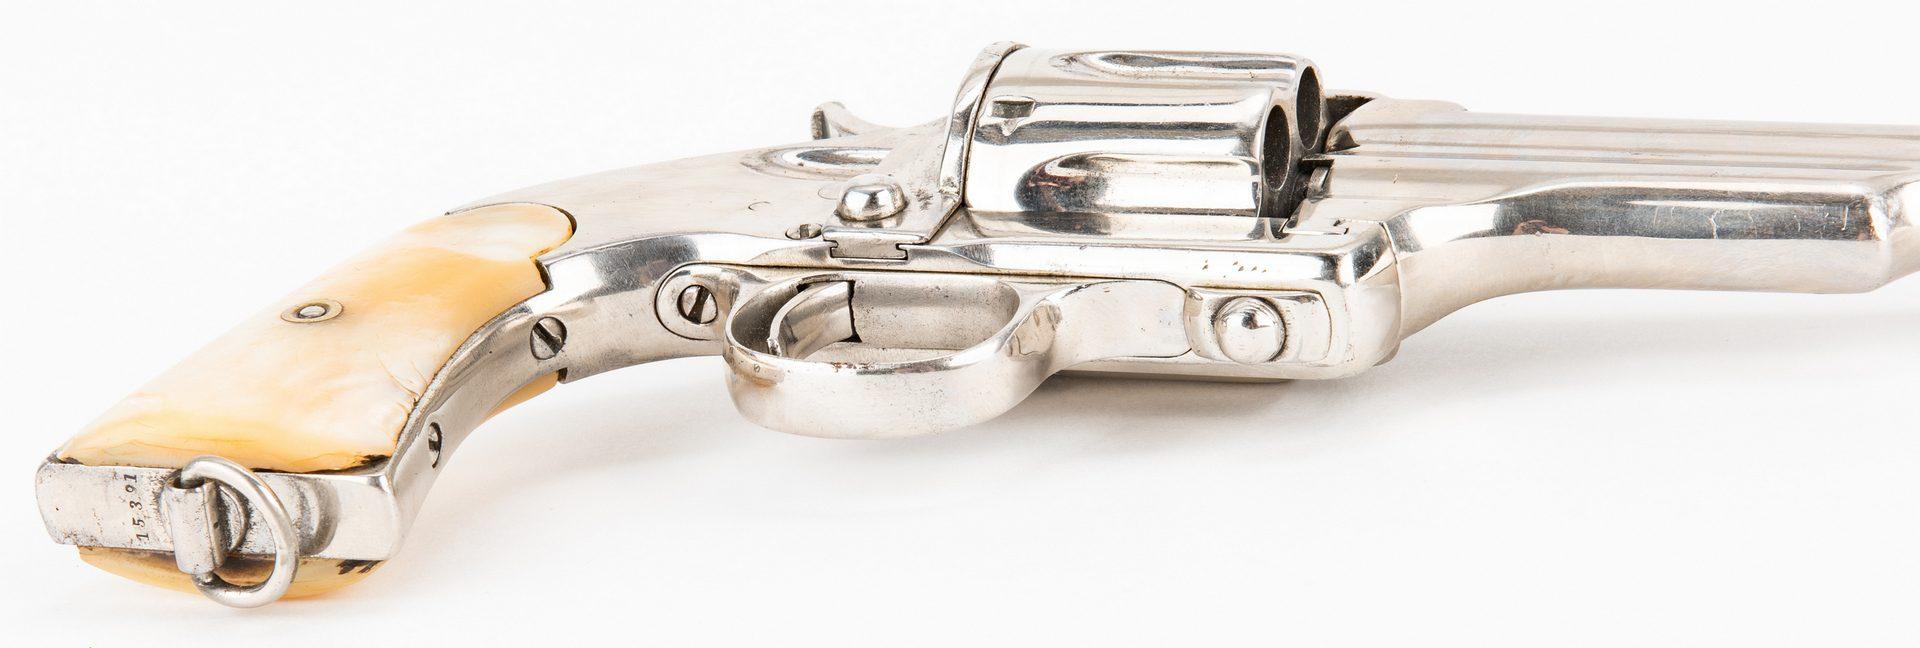 Lot 784: Merwin & Hulbert 3rd Model Frontier Army SA Revolver, .44-40 WCF